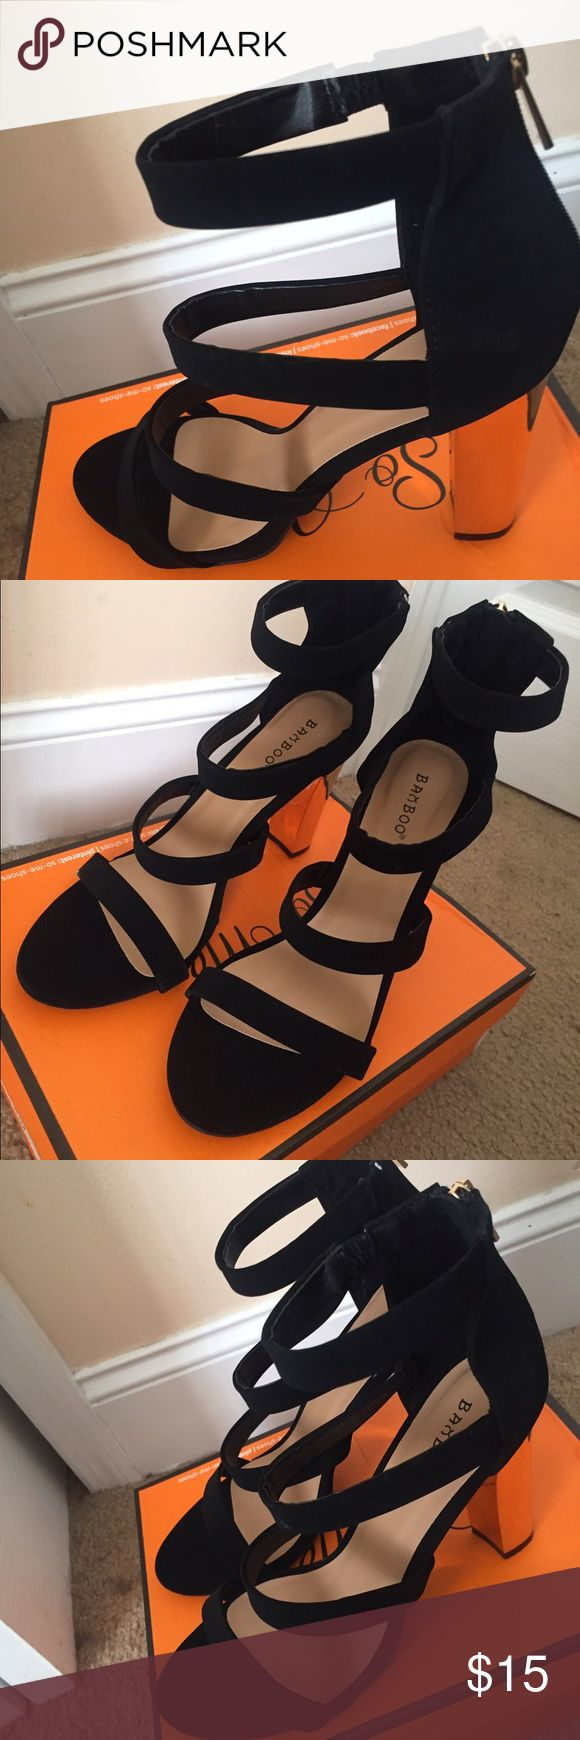 Black & gold sandal heels Black & gold chunky heels 3 strap zip up sandal heels bamboo Shoes Heels